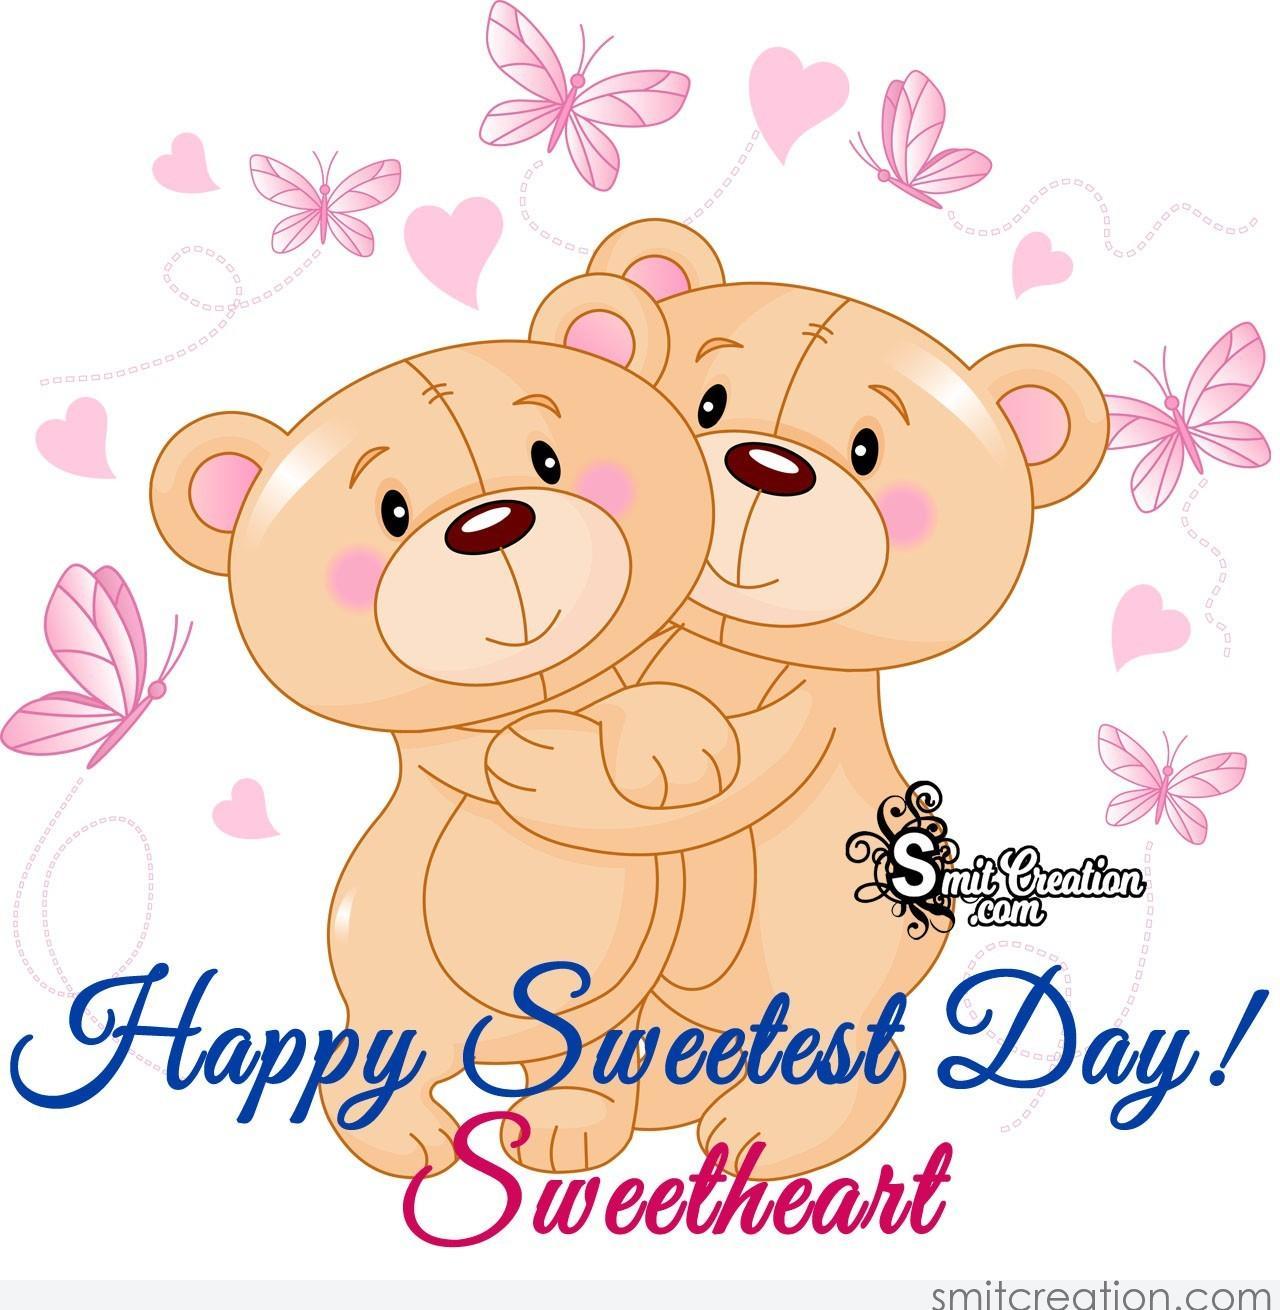 Happy Sweetest Day Sweetheart Smitcreation